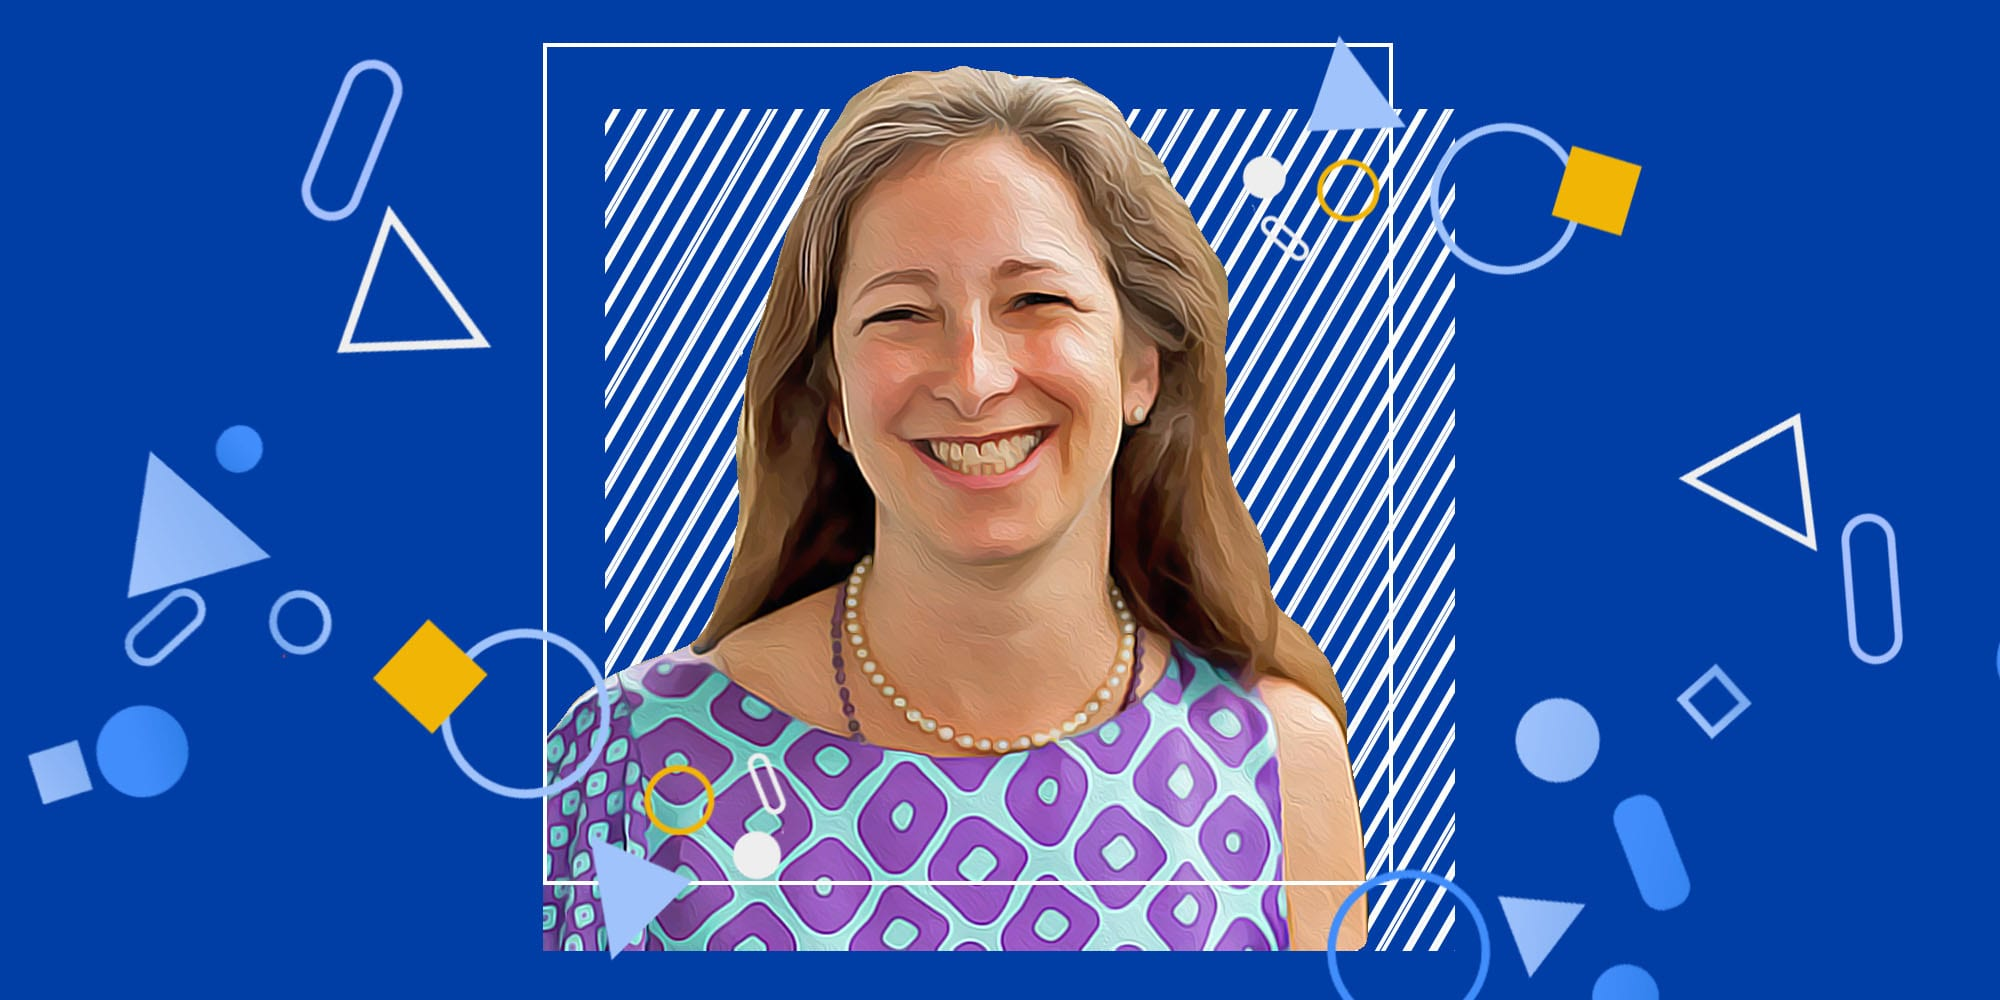 Career diary: Molly Shoichet became a great leader through lifelong learning